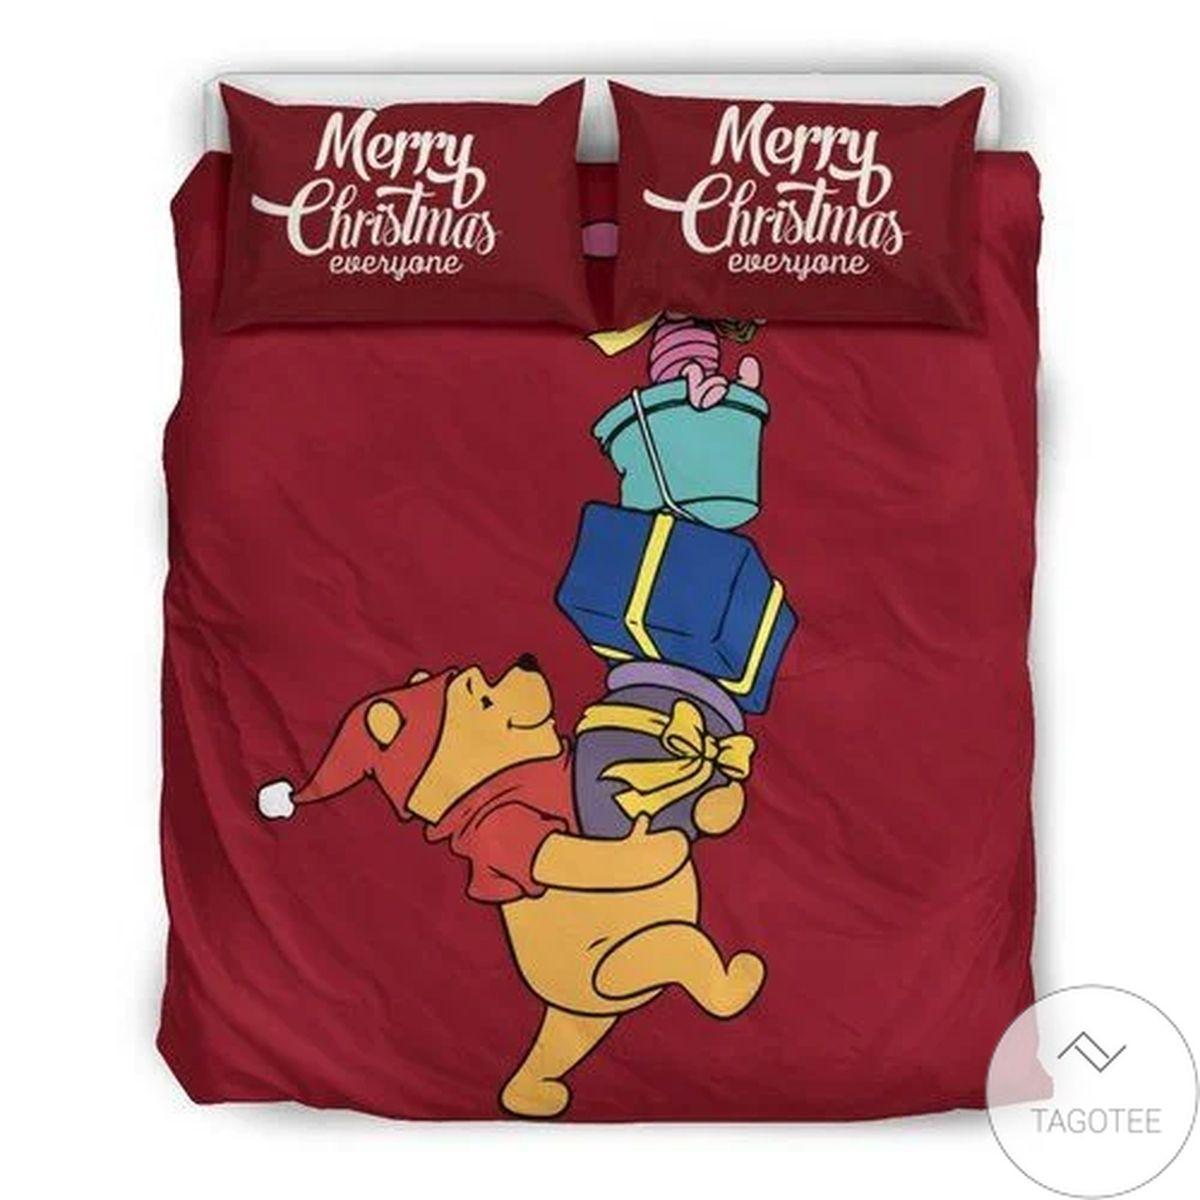 Winnie The Pooh Merry Christmas Everyone Bedding Set